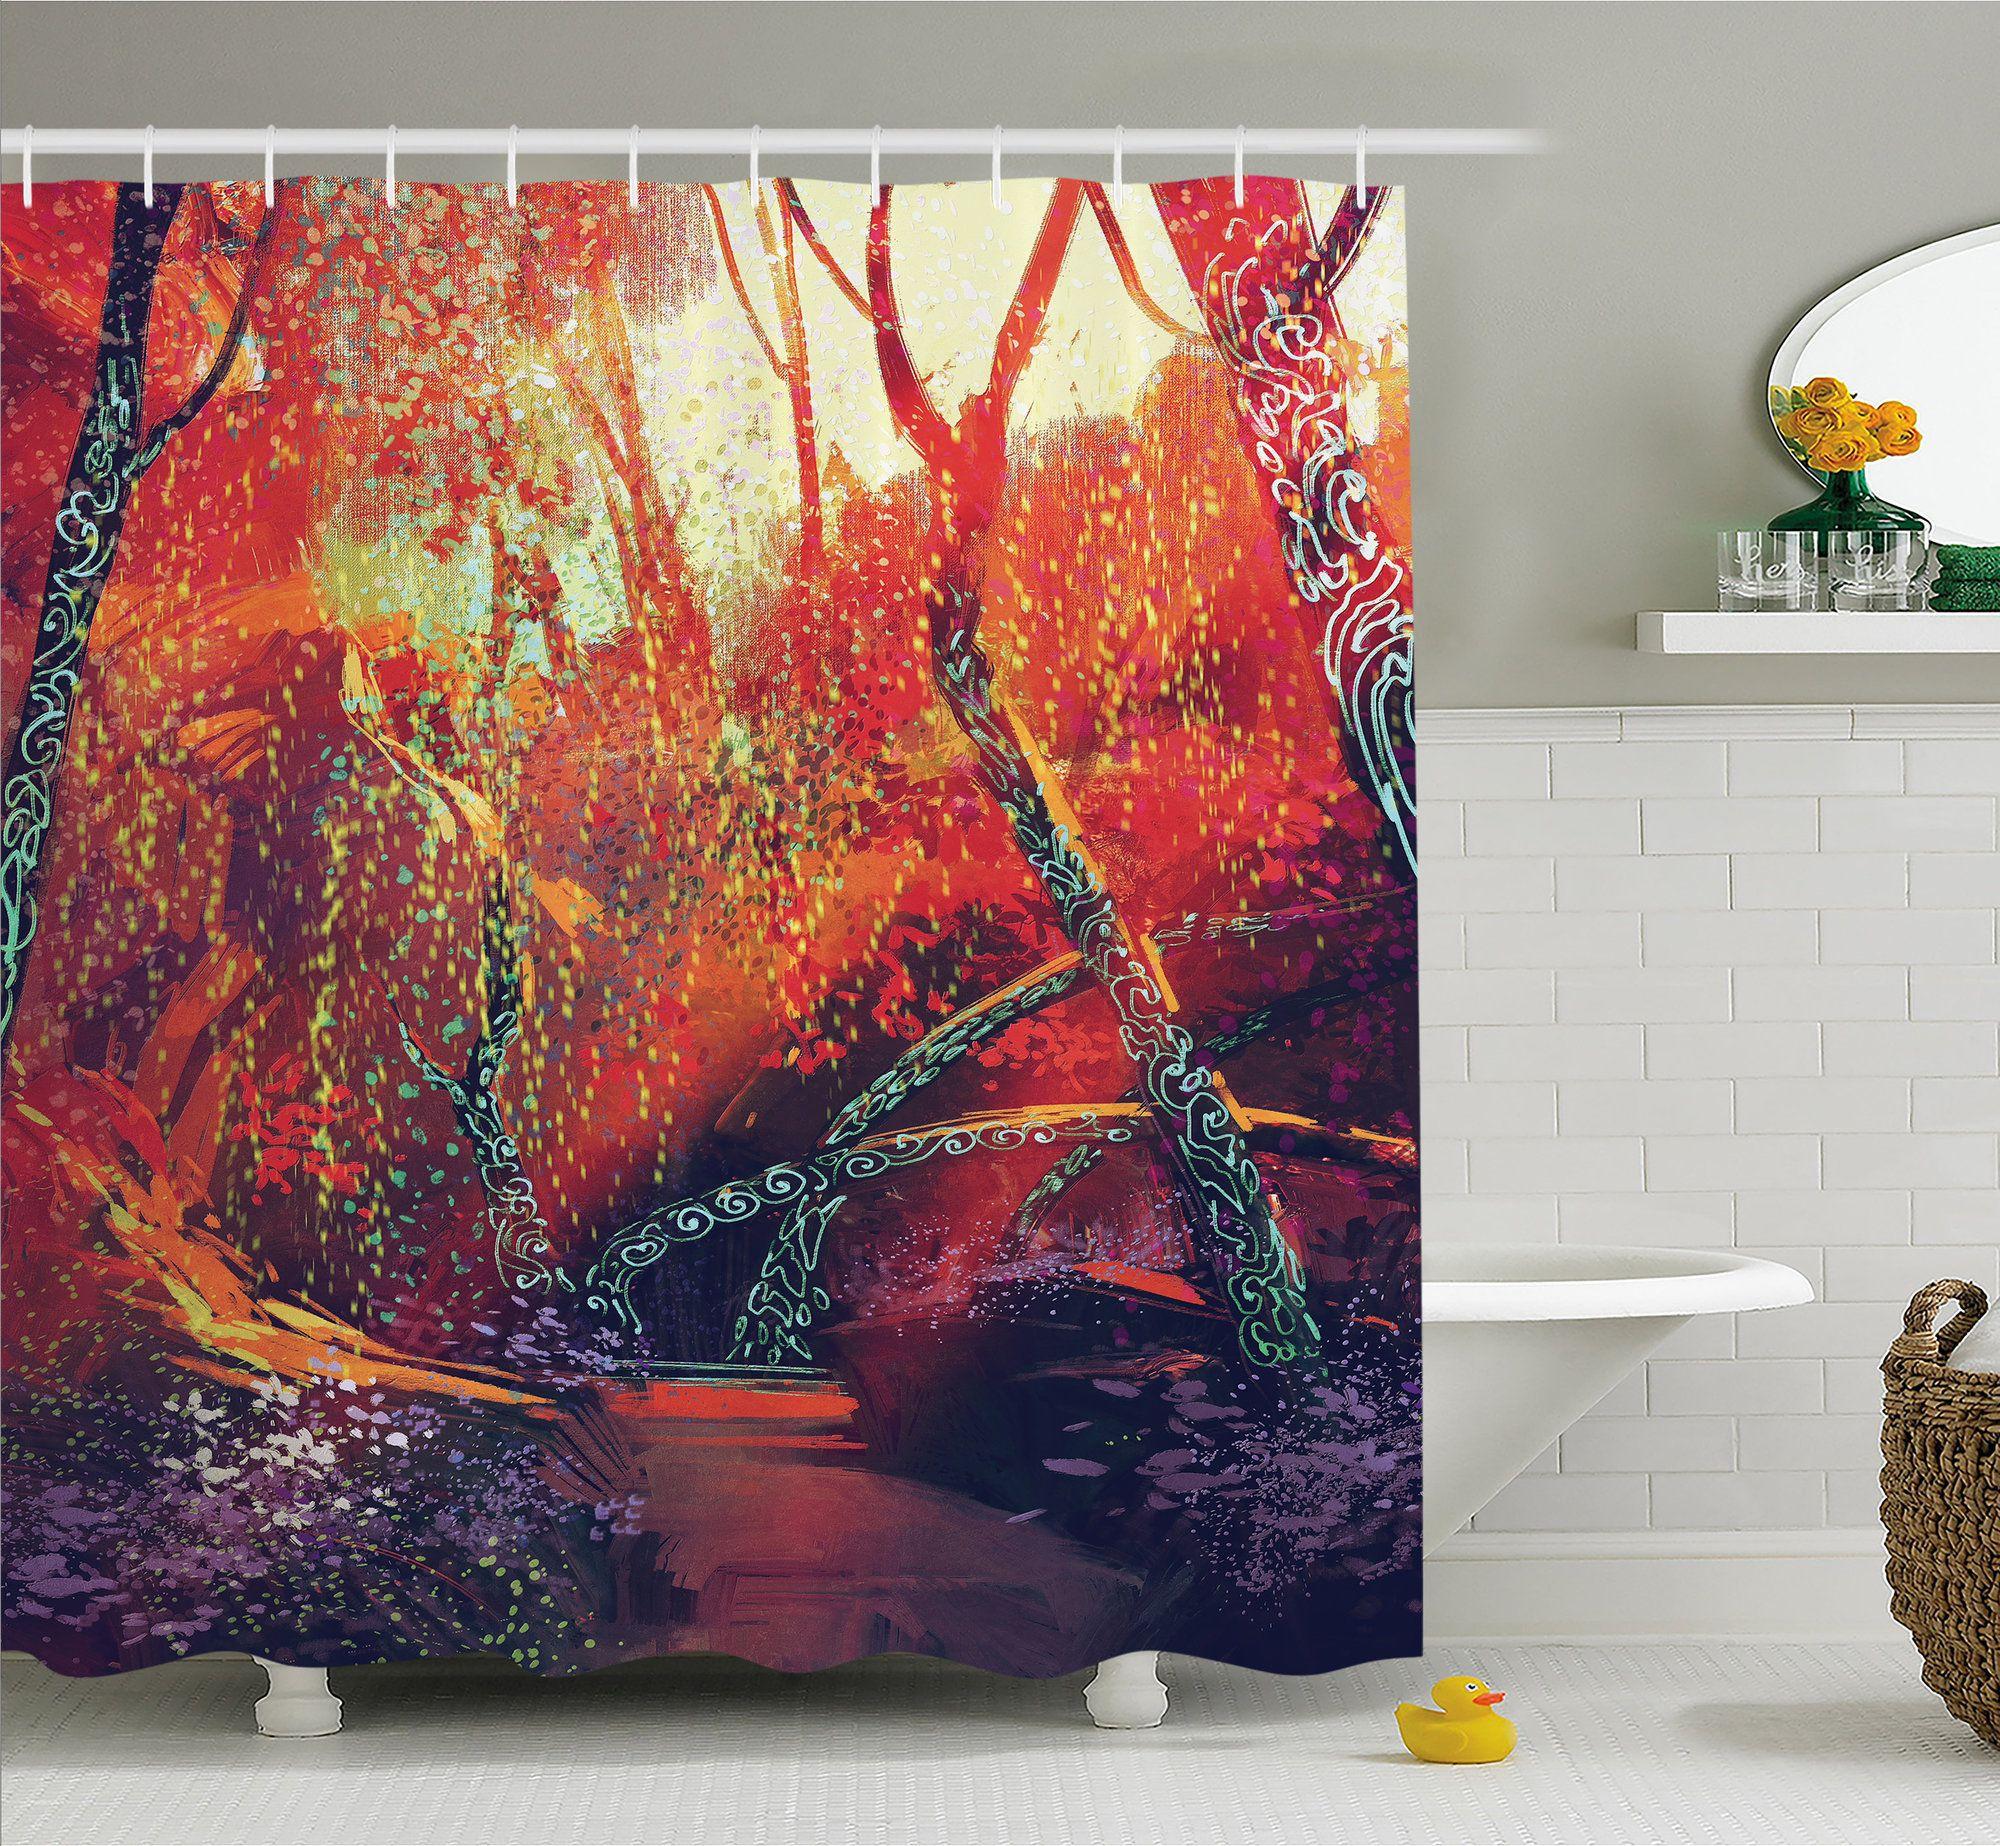 Fantasy Art House Fall Autumn Scenery In Habitat Fairy Tale Woodland Fiction View Shower Curtain Set